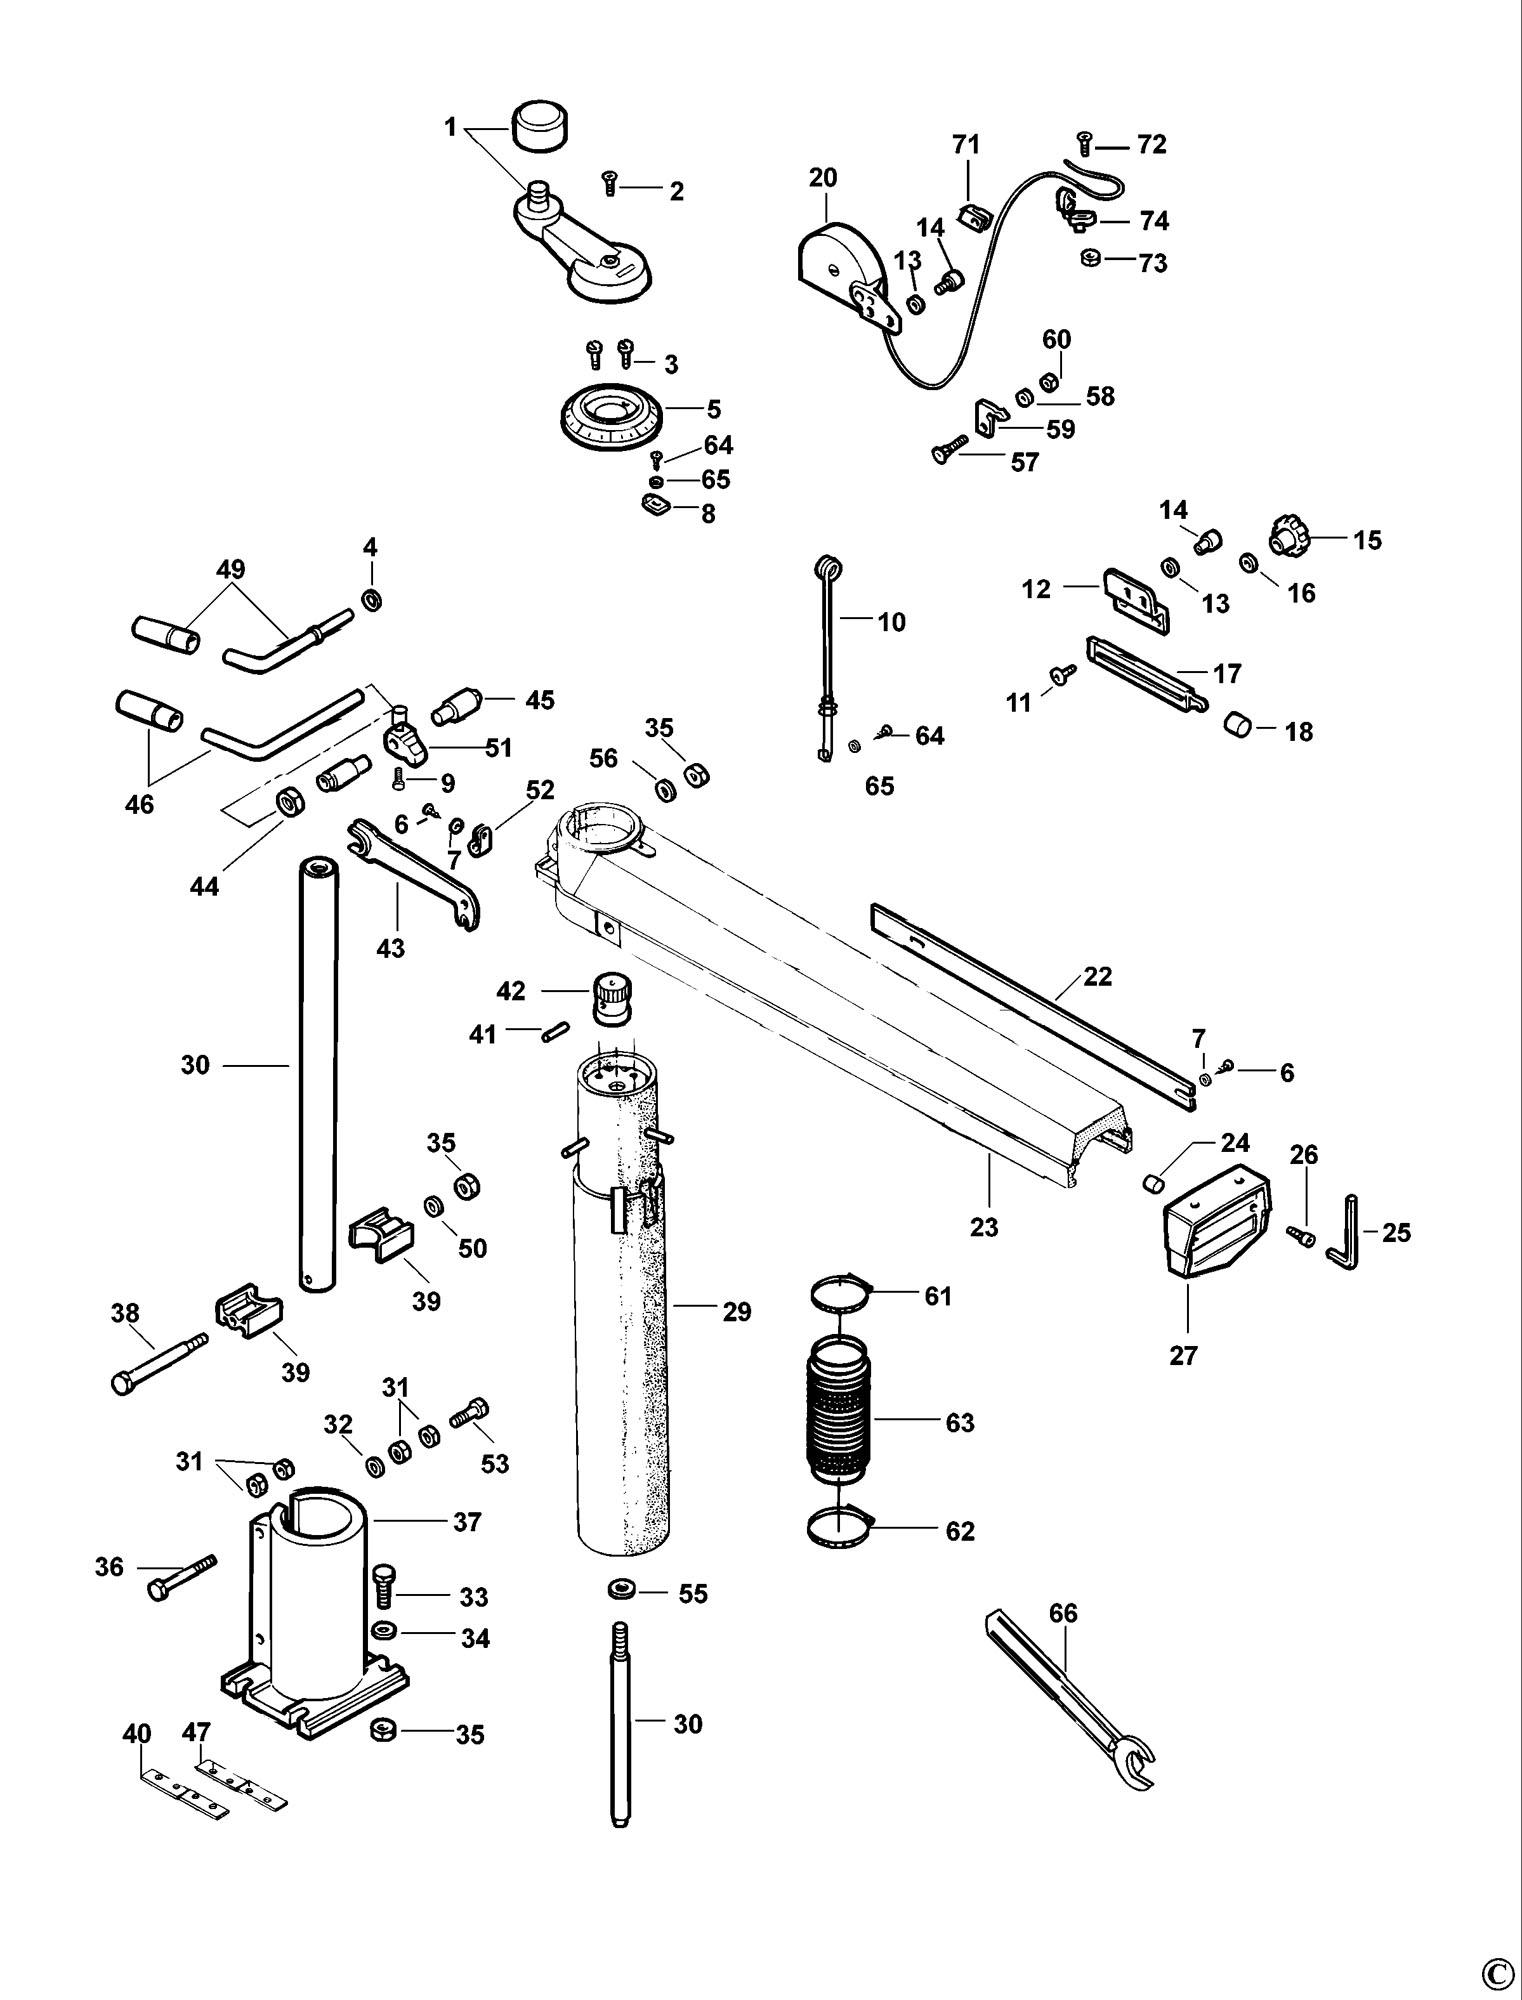 spares for dewalt dw721 radial arm saw  type 3  spare De Walt Radial Arm Saw Motor De Walt Radial Arm Saw Models